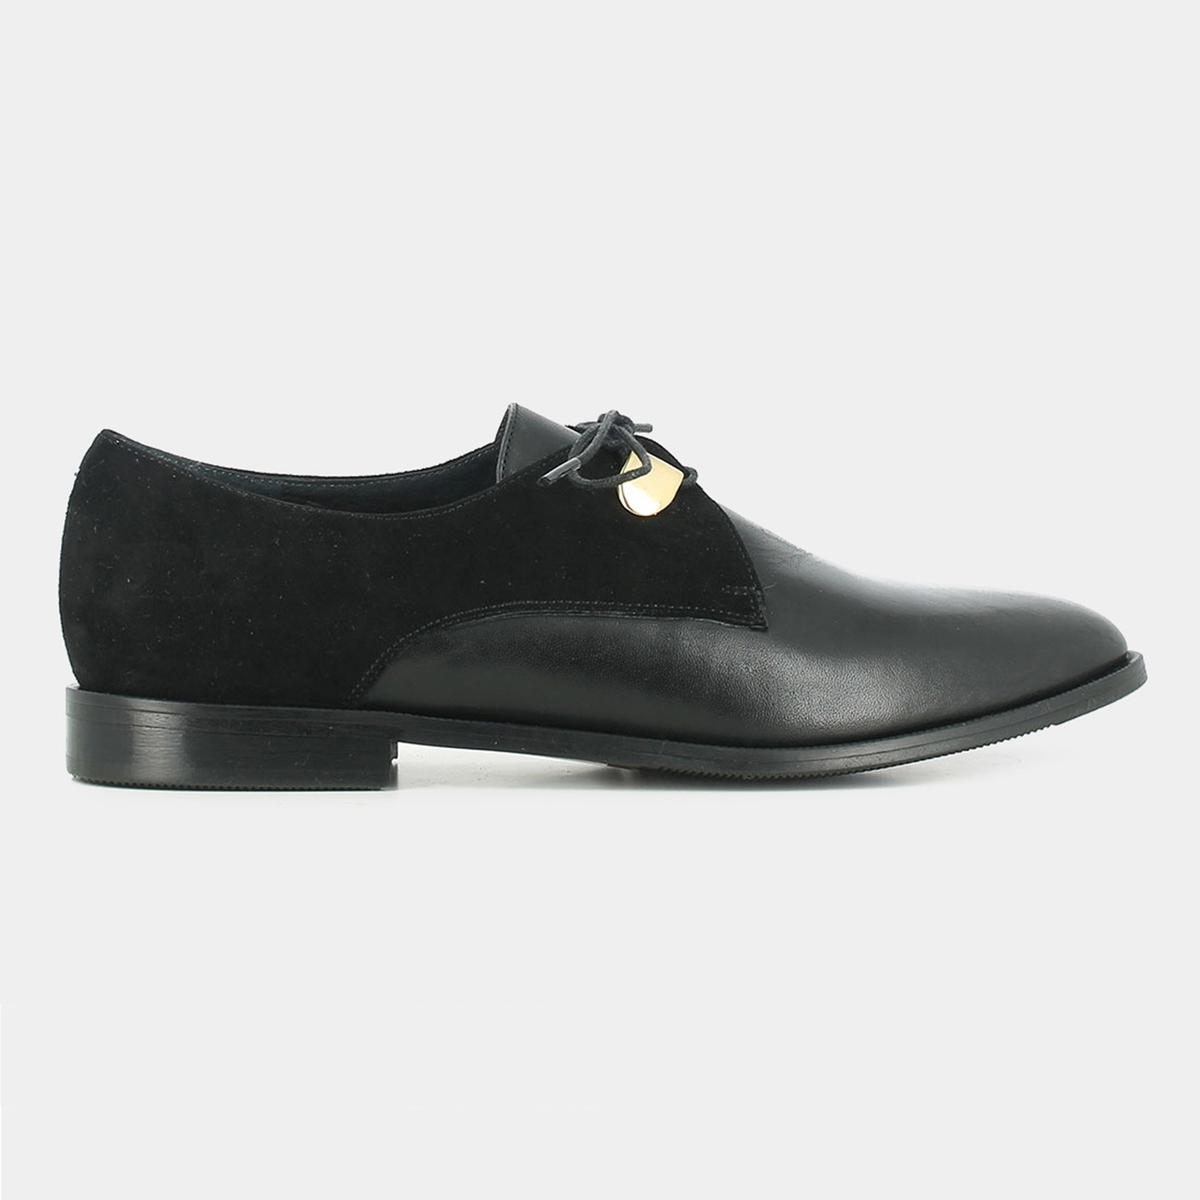 Ботинки-дерби из кожи Divya ботинки дерби из мягкой кожи takarika